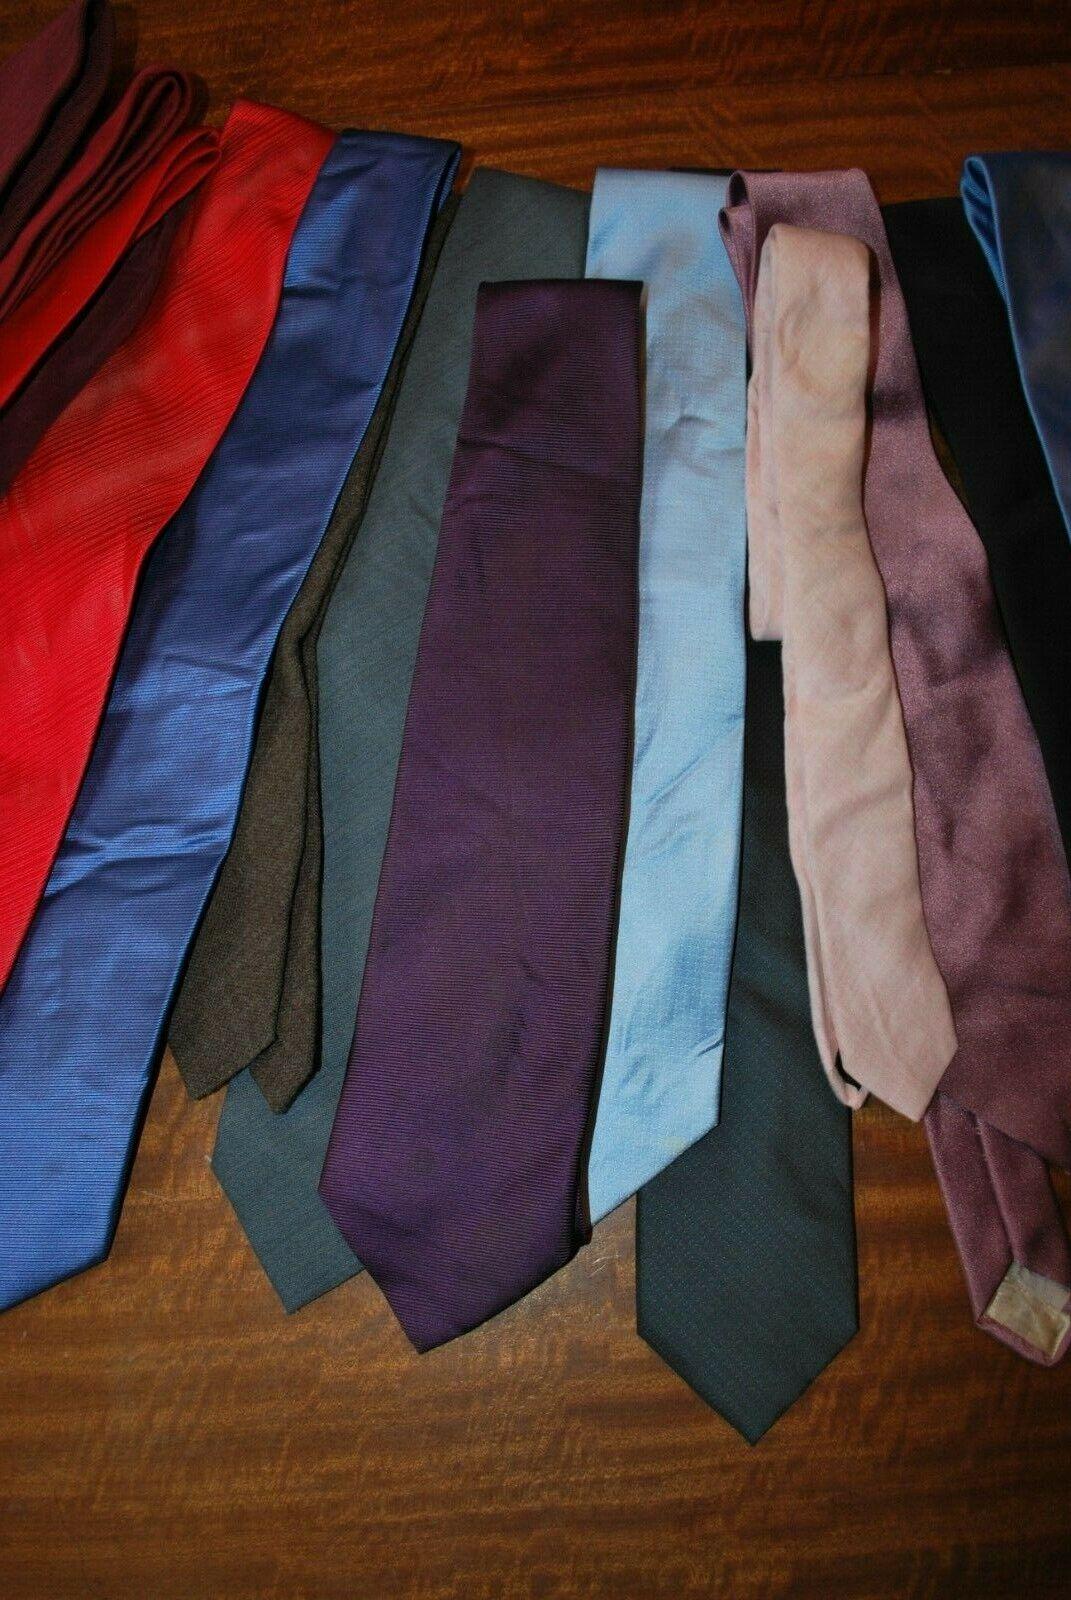 15 x various coloured Tie's job lot bulk buy 6